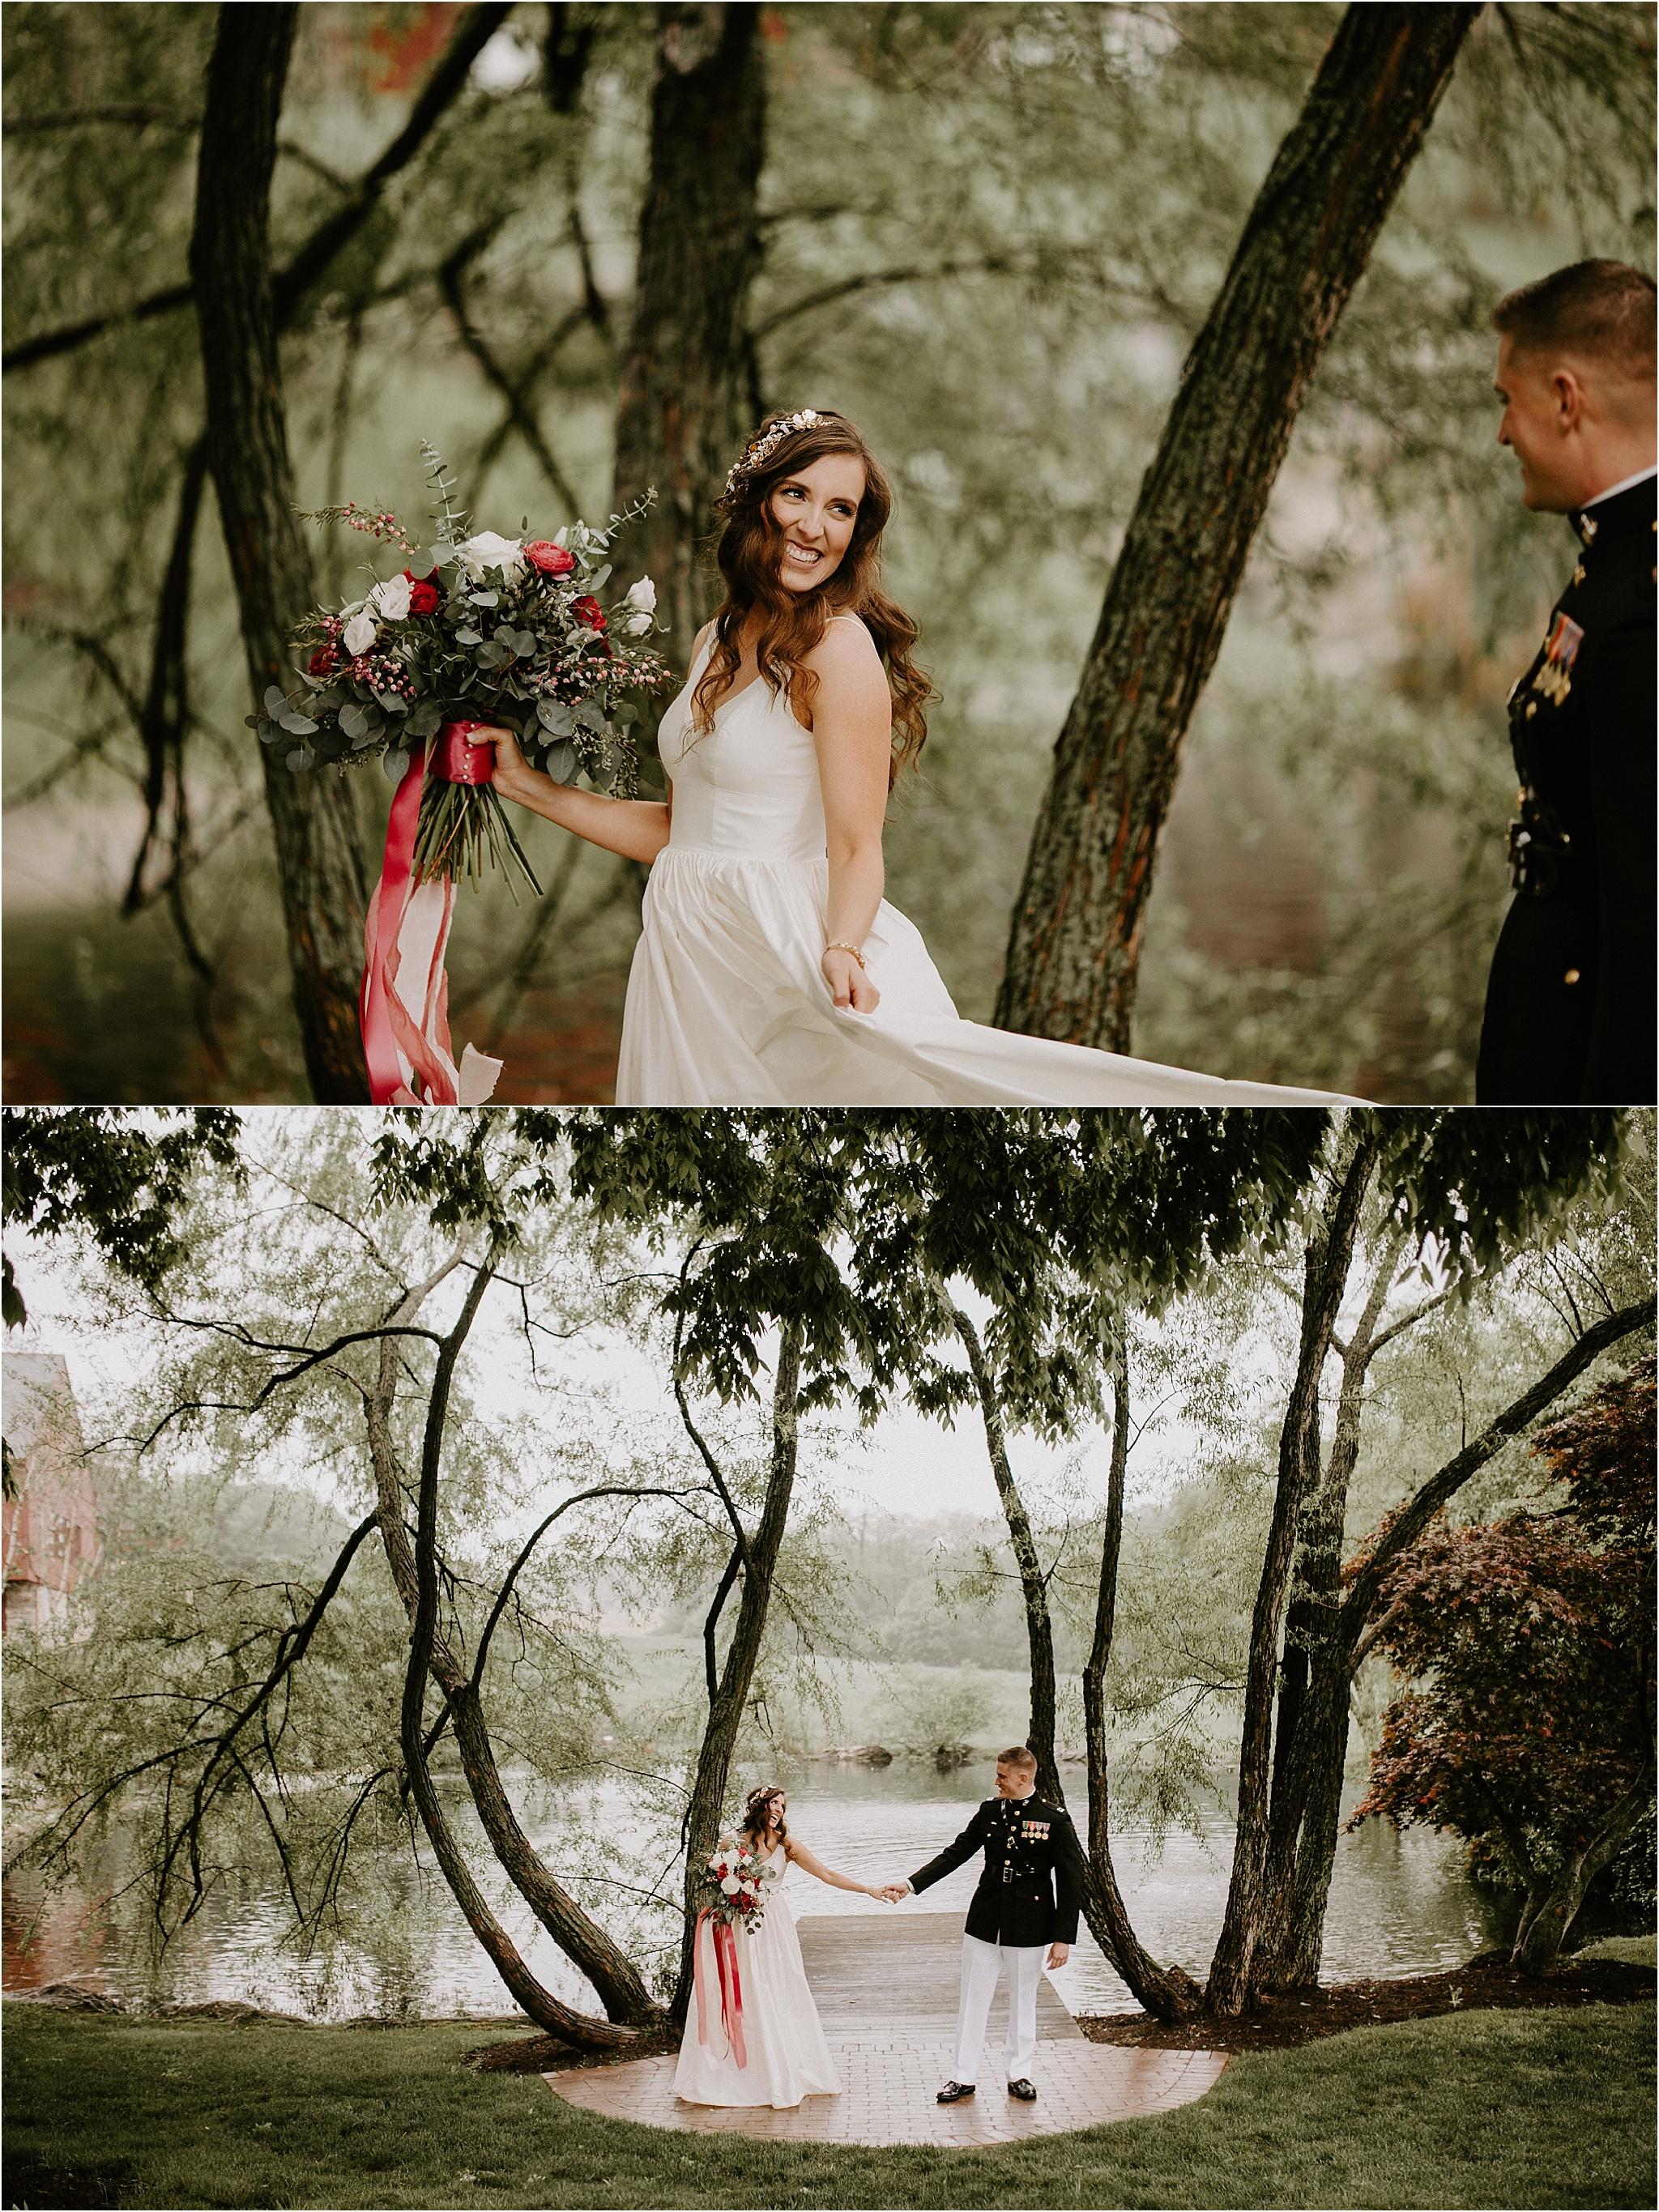 Sarah_Brookhart_Farm_at_Eagles_Ridge_Wedding_Photographer_0024.jpg